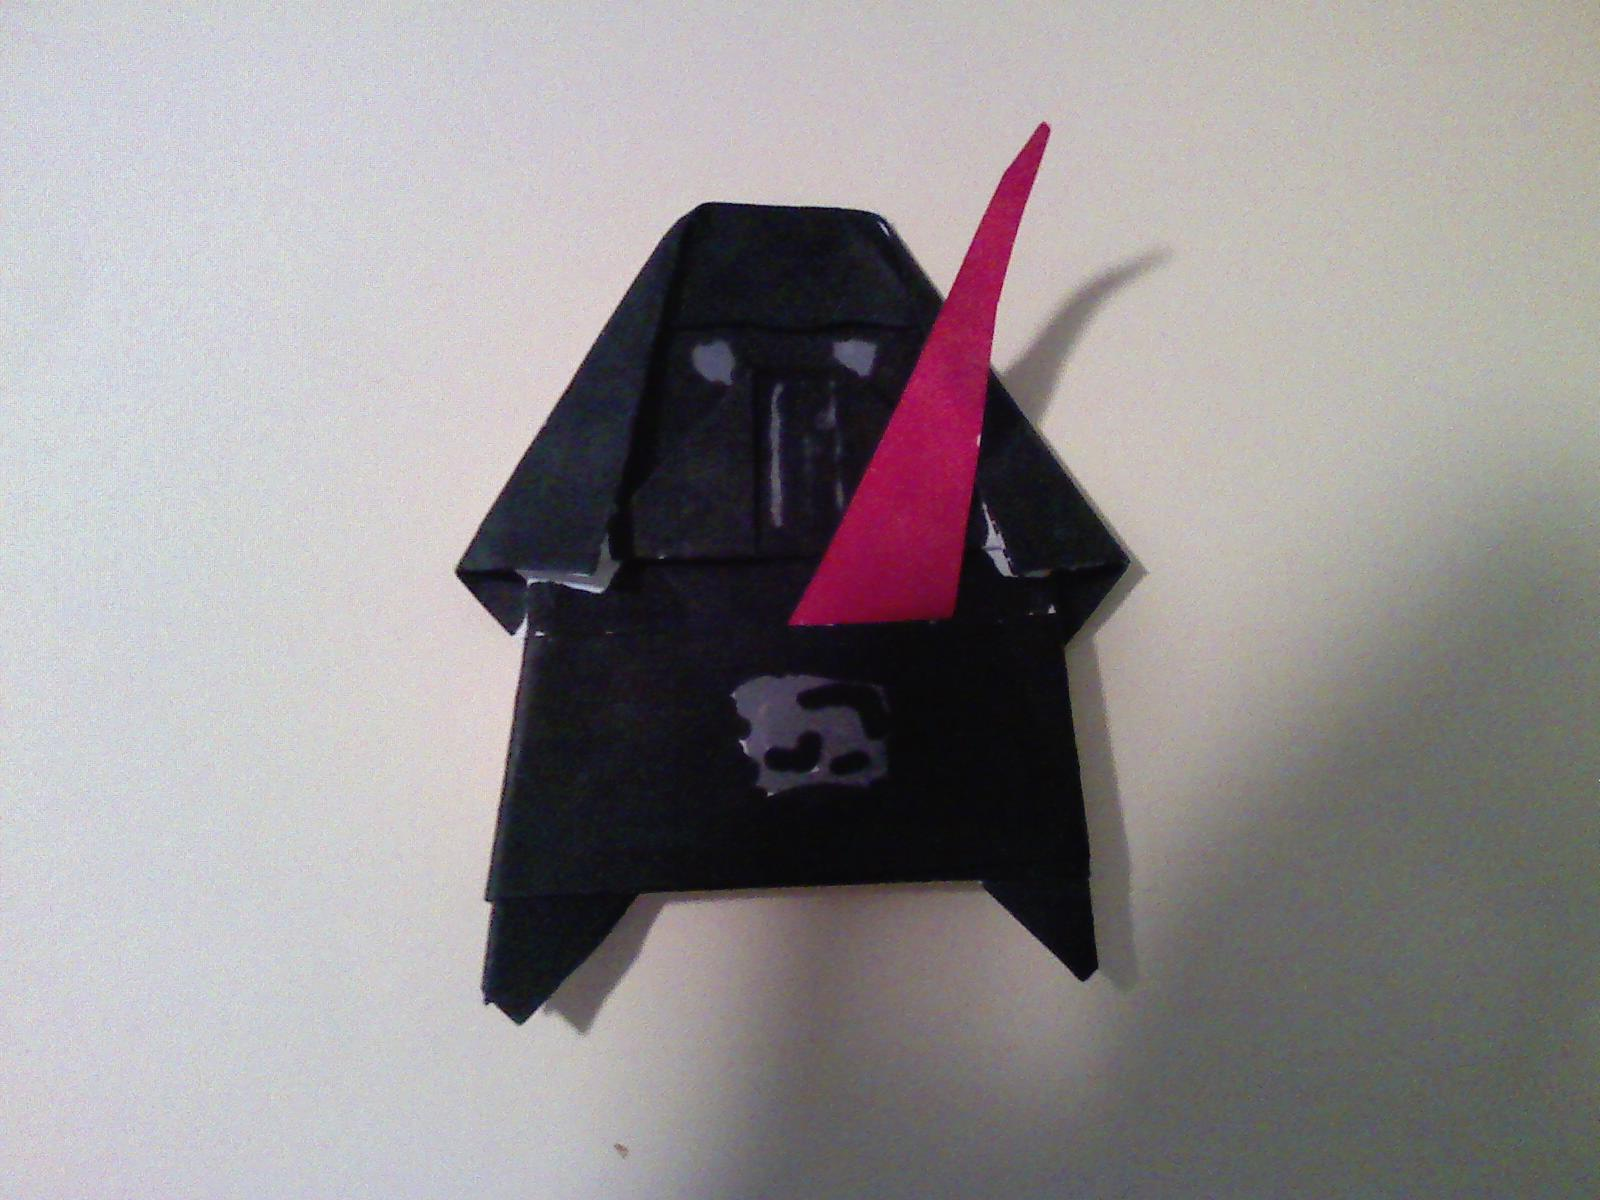 How To Make Origami Darth Vader